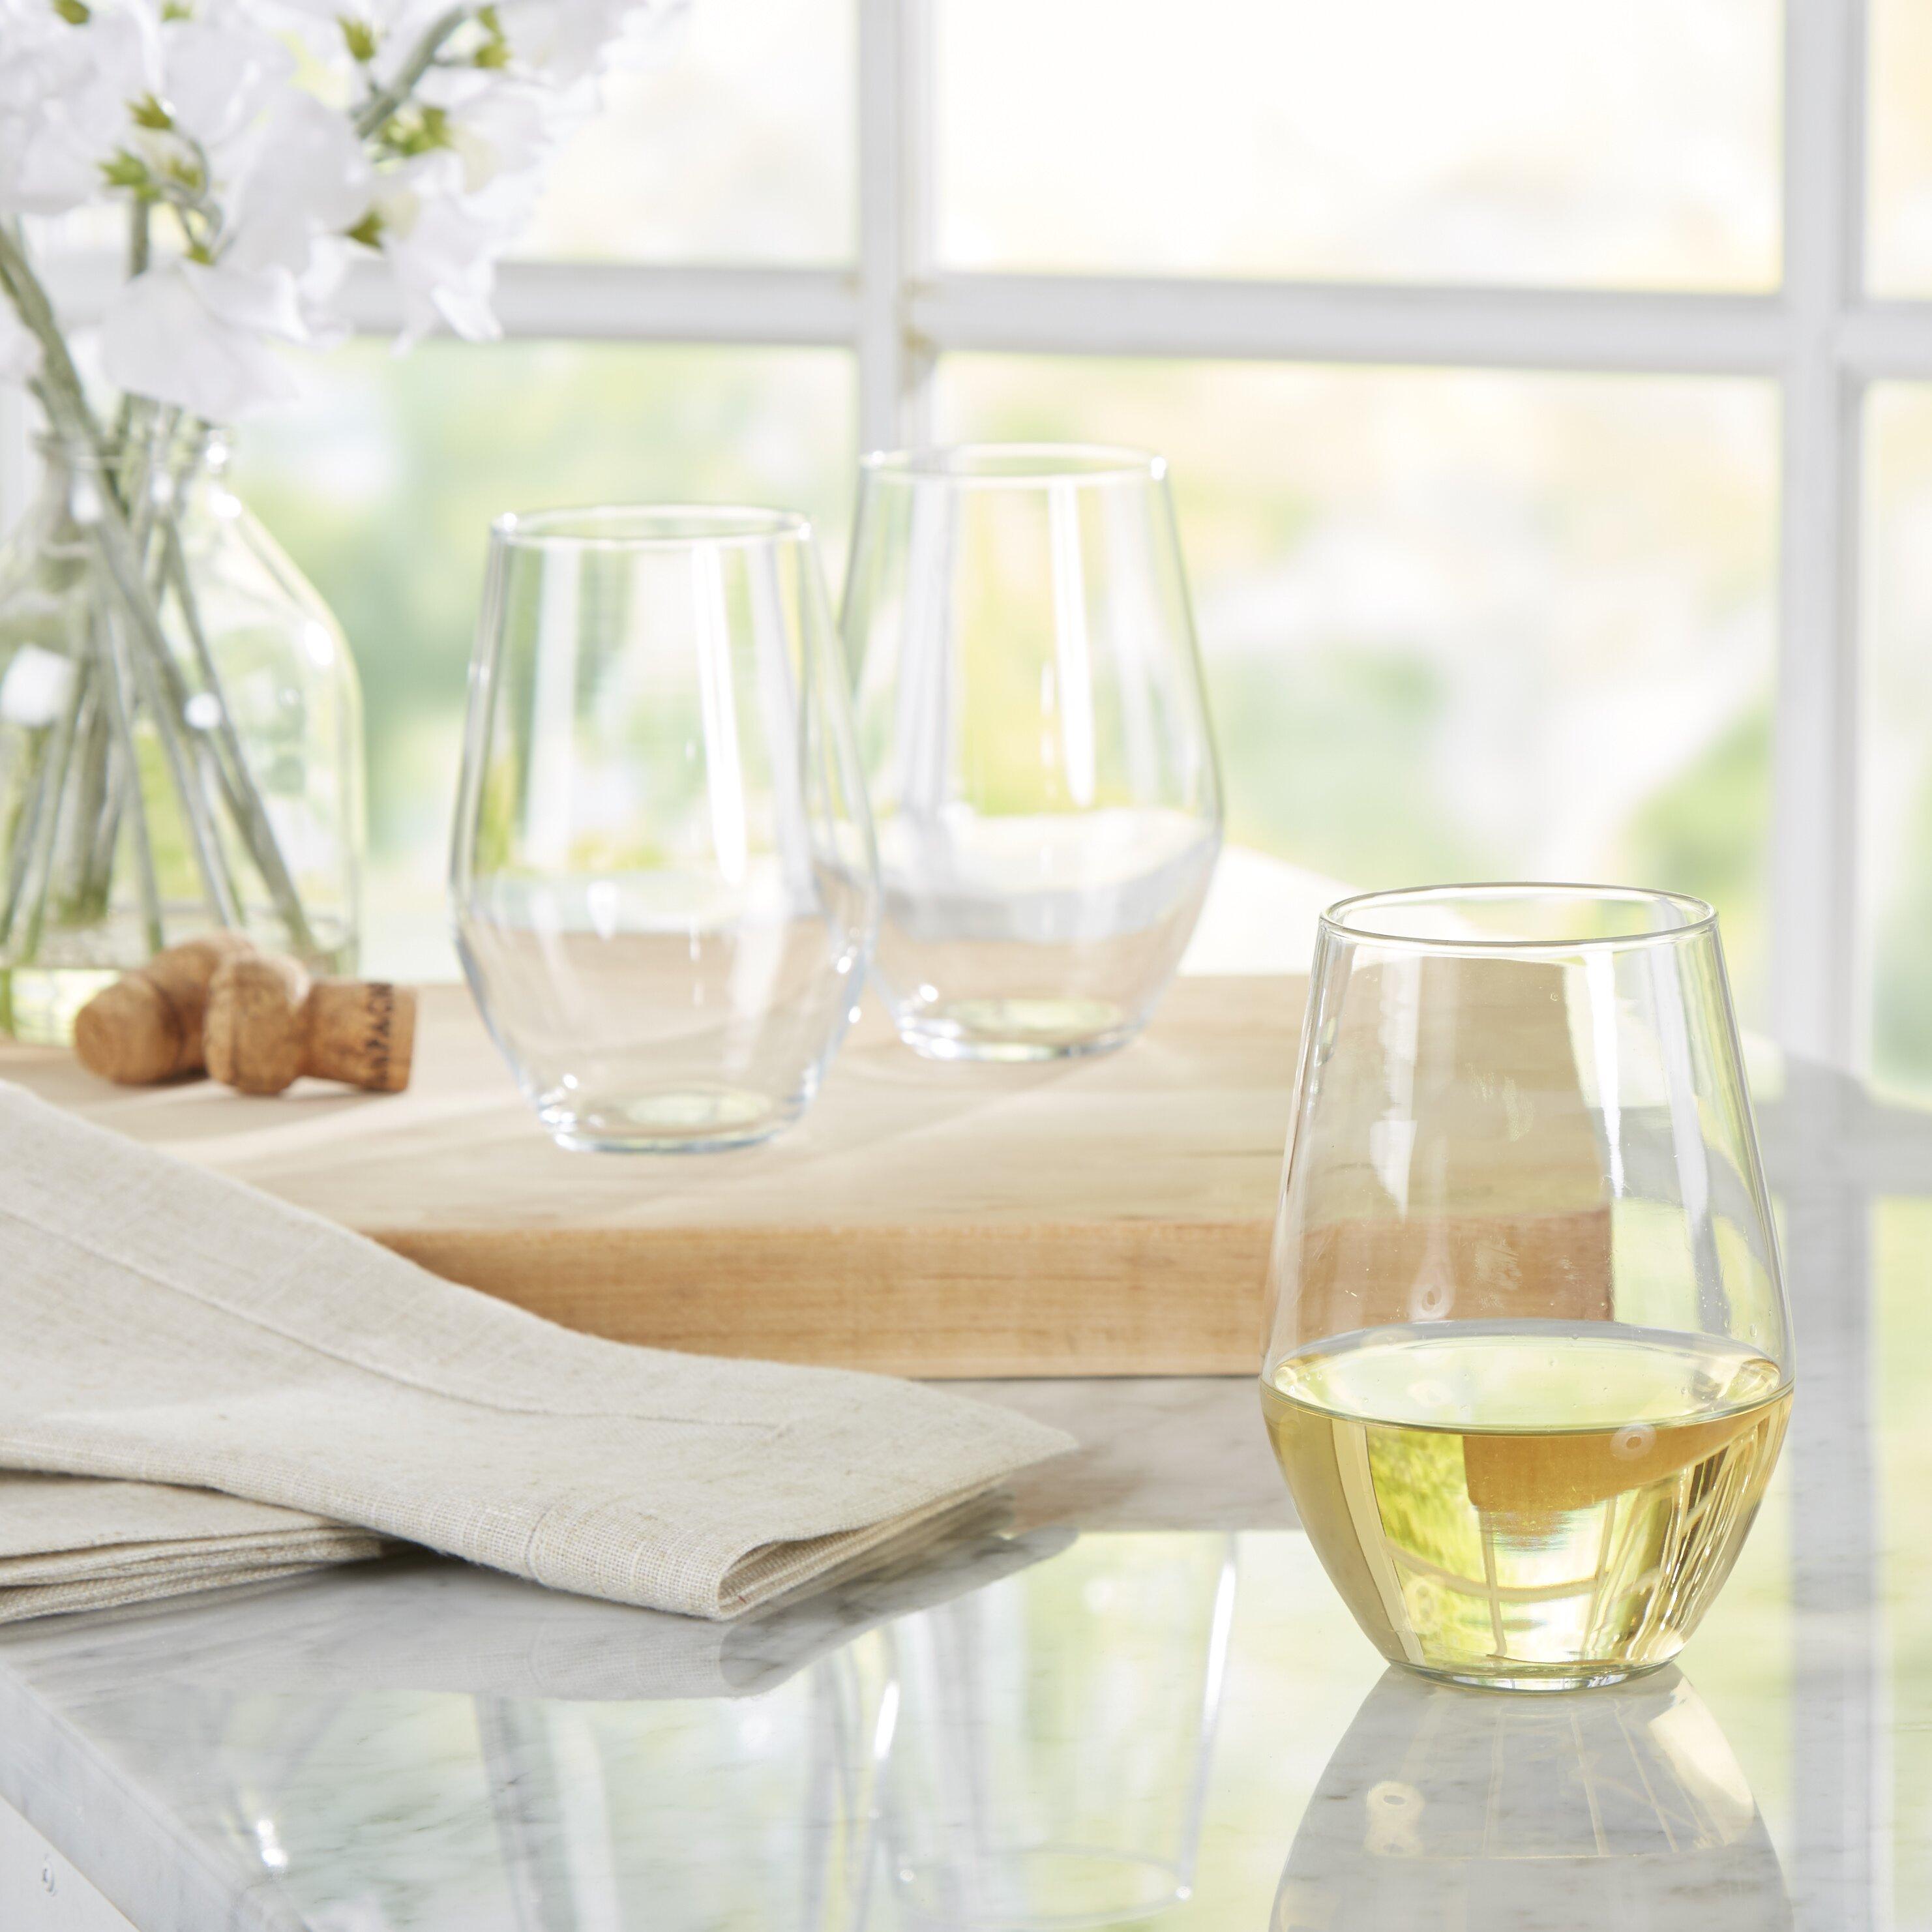 luminarc concerto btd 19 oz stemless wine glass reviews wayfair. Black Bedroom Furniture Sets. Home Design Ideas